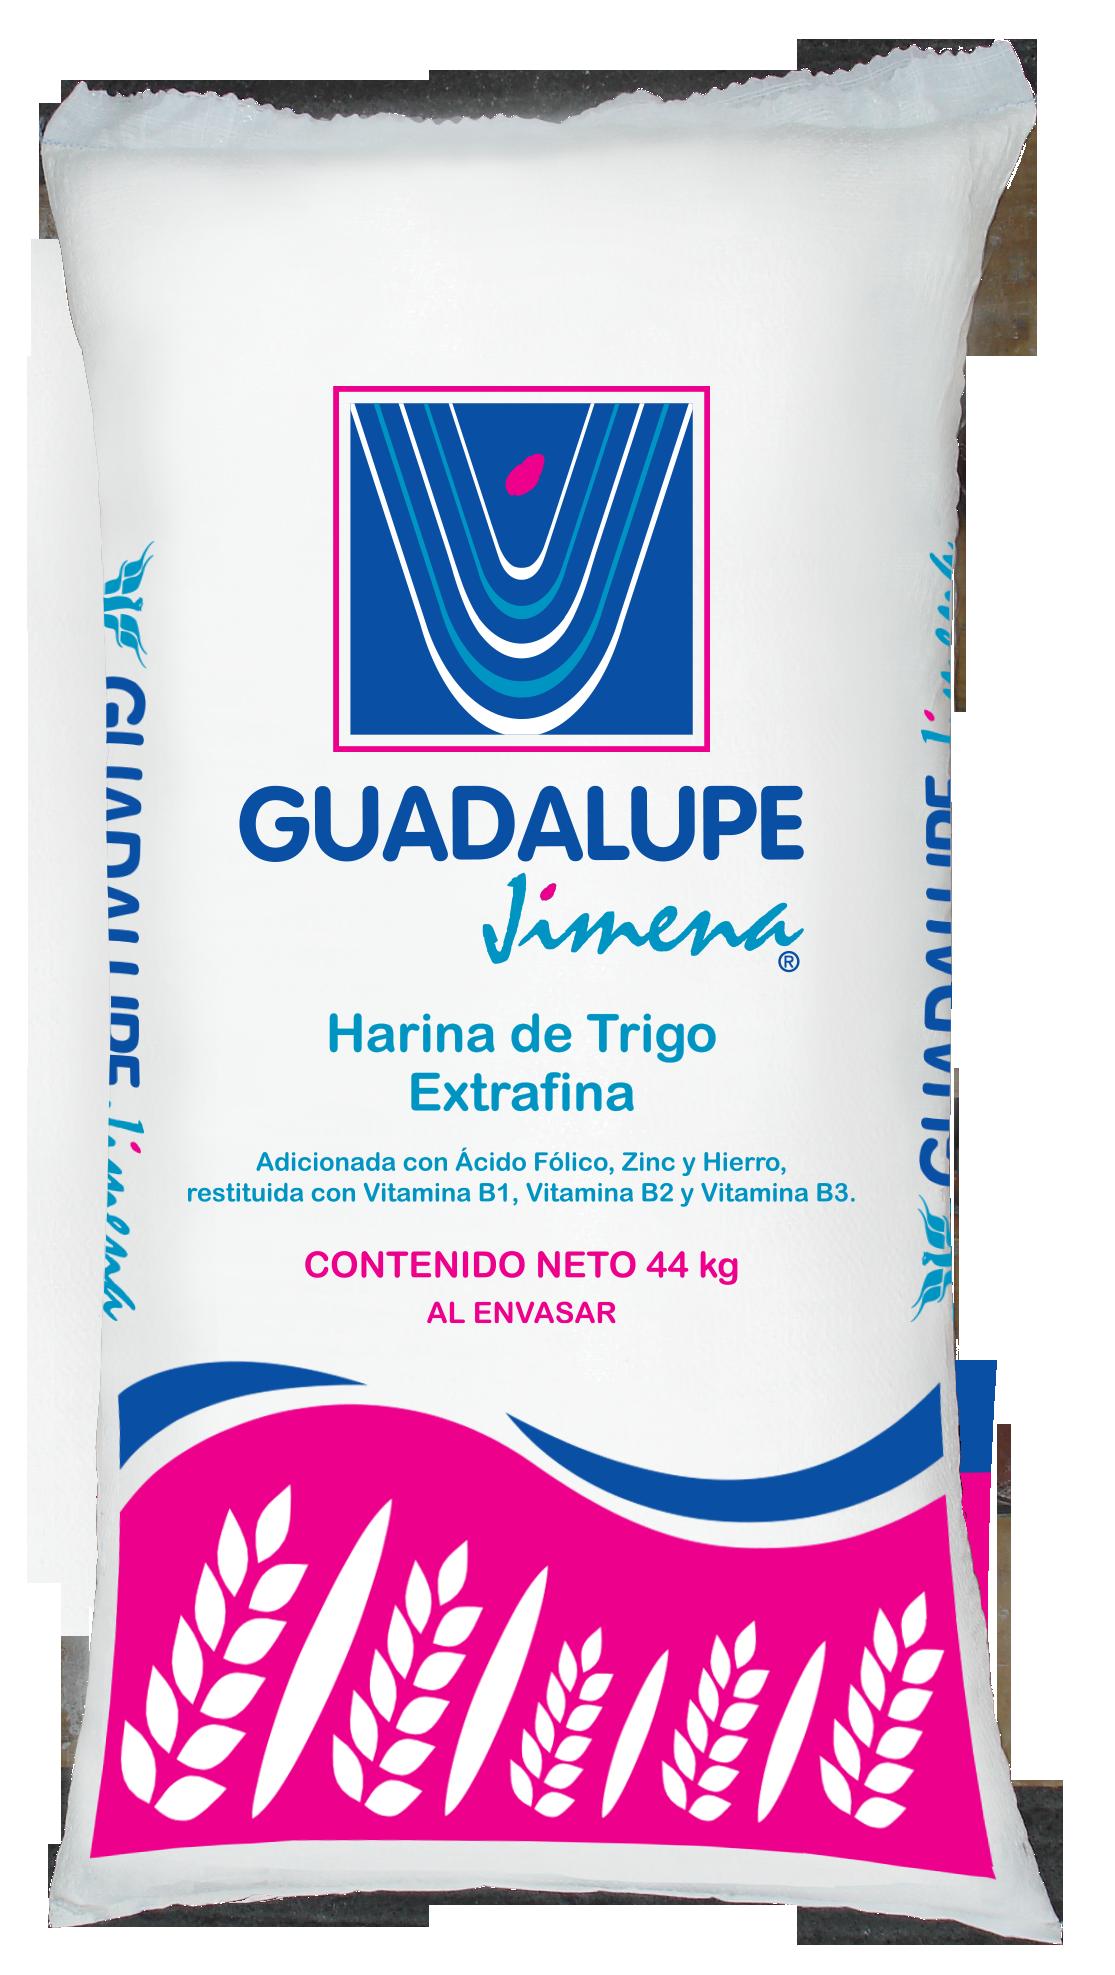 Presentaciones de Harina de Trigo Guadalupe Jimena